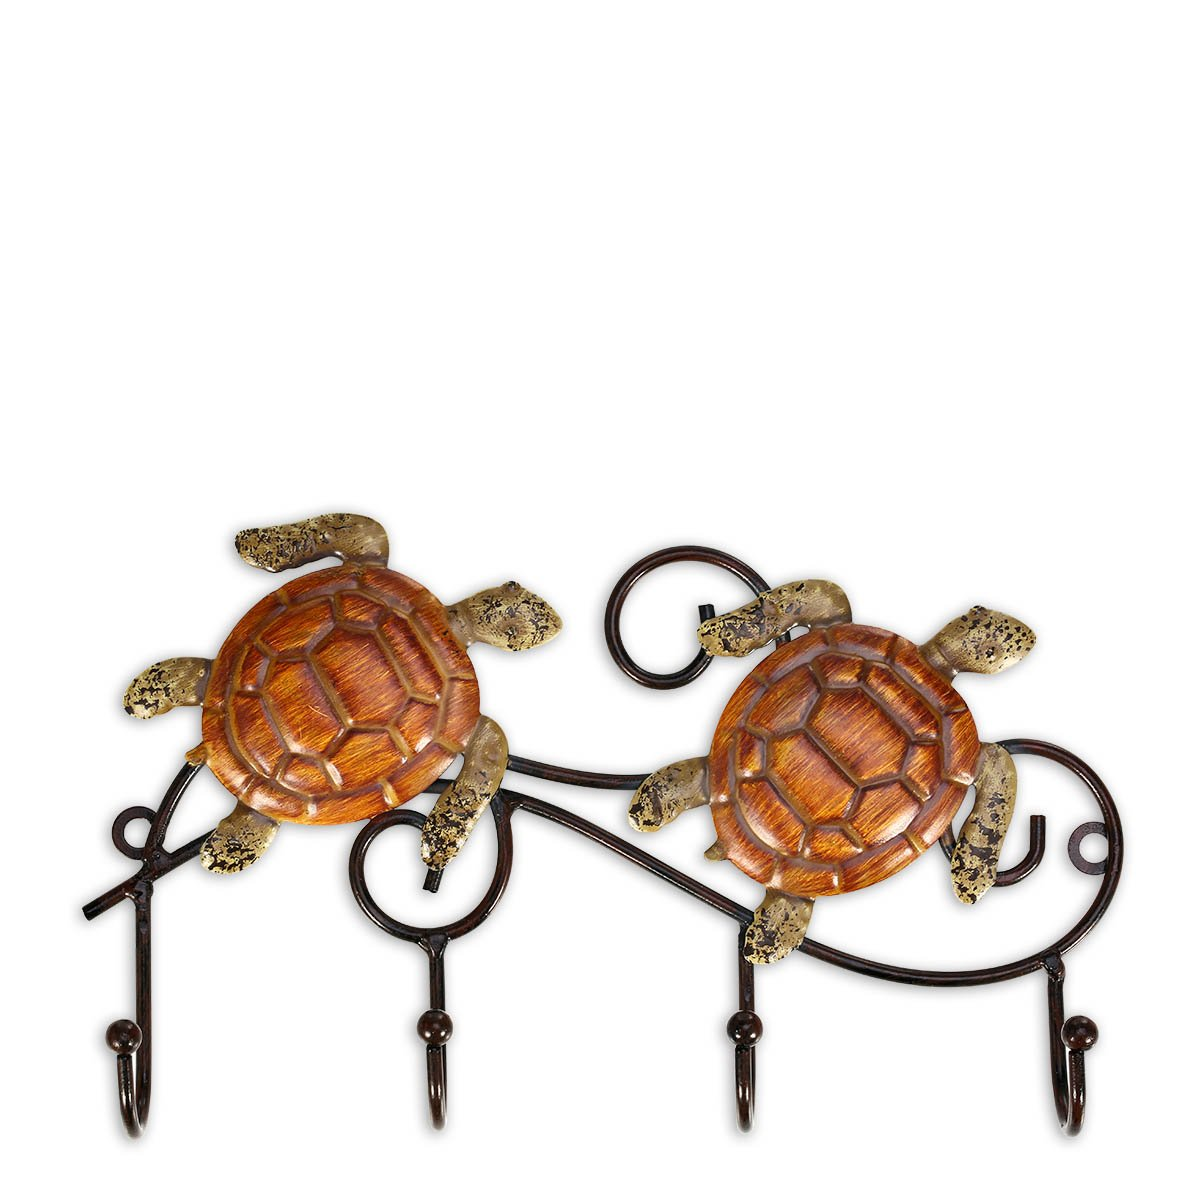 Tooarts Iron Wall Hanger Vintage Design with 4 Hooks Coats Keys Bags Hanger Wall Mounted Decorative Gift Idea